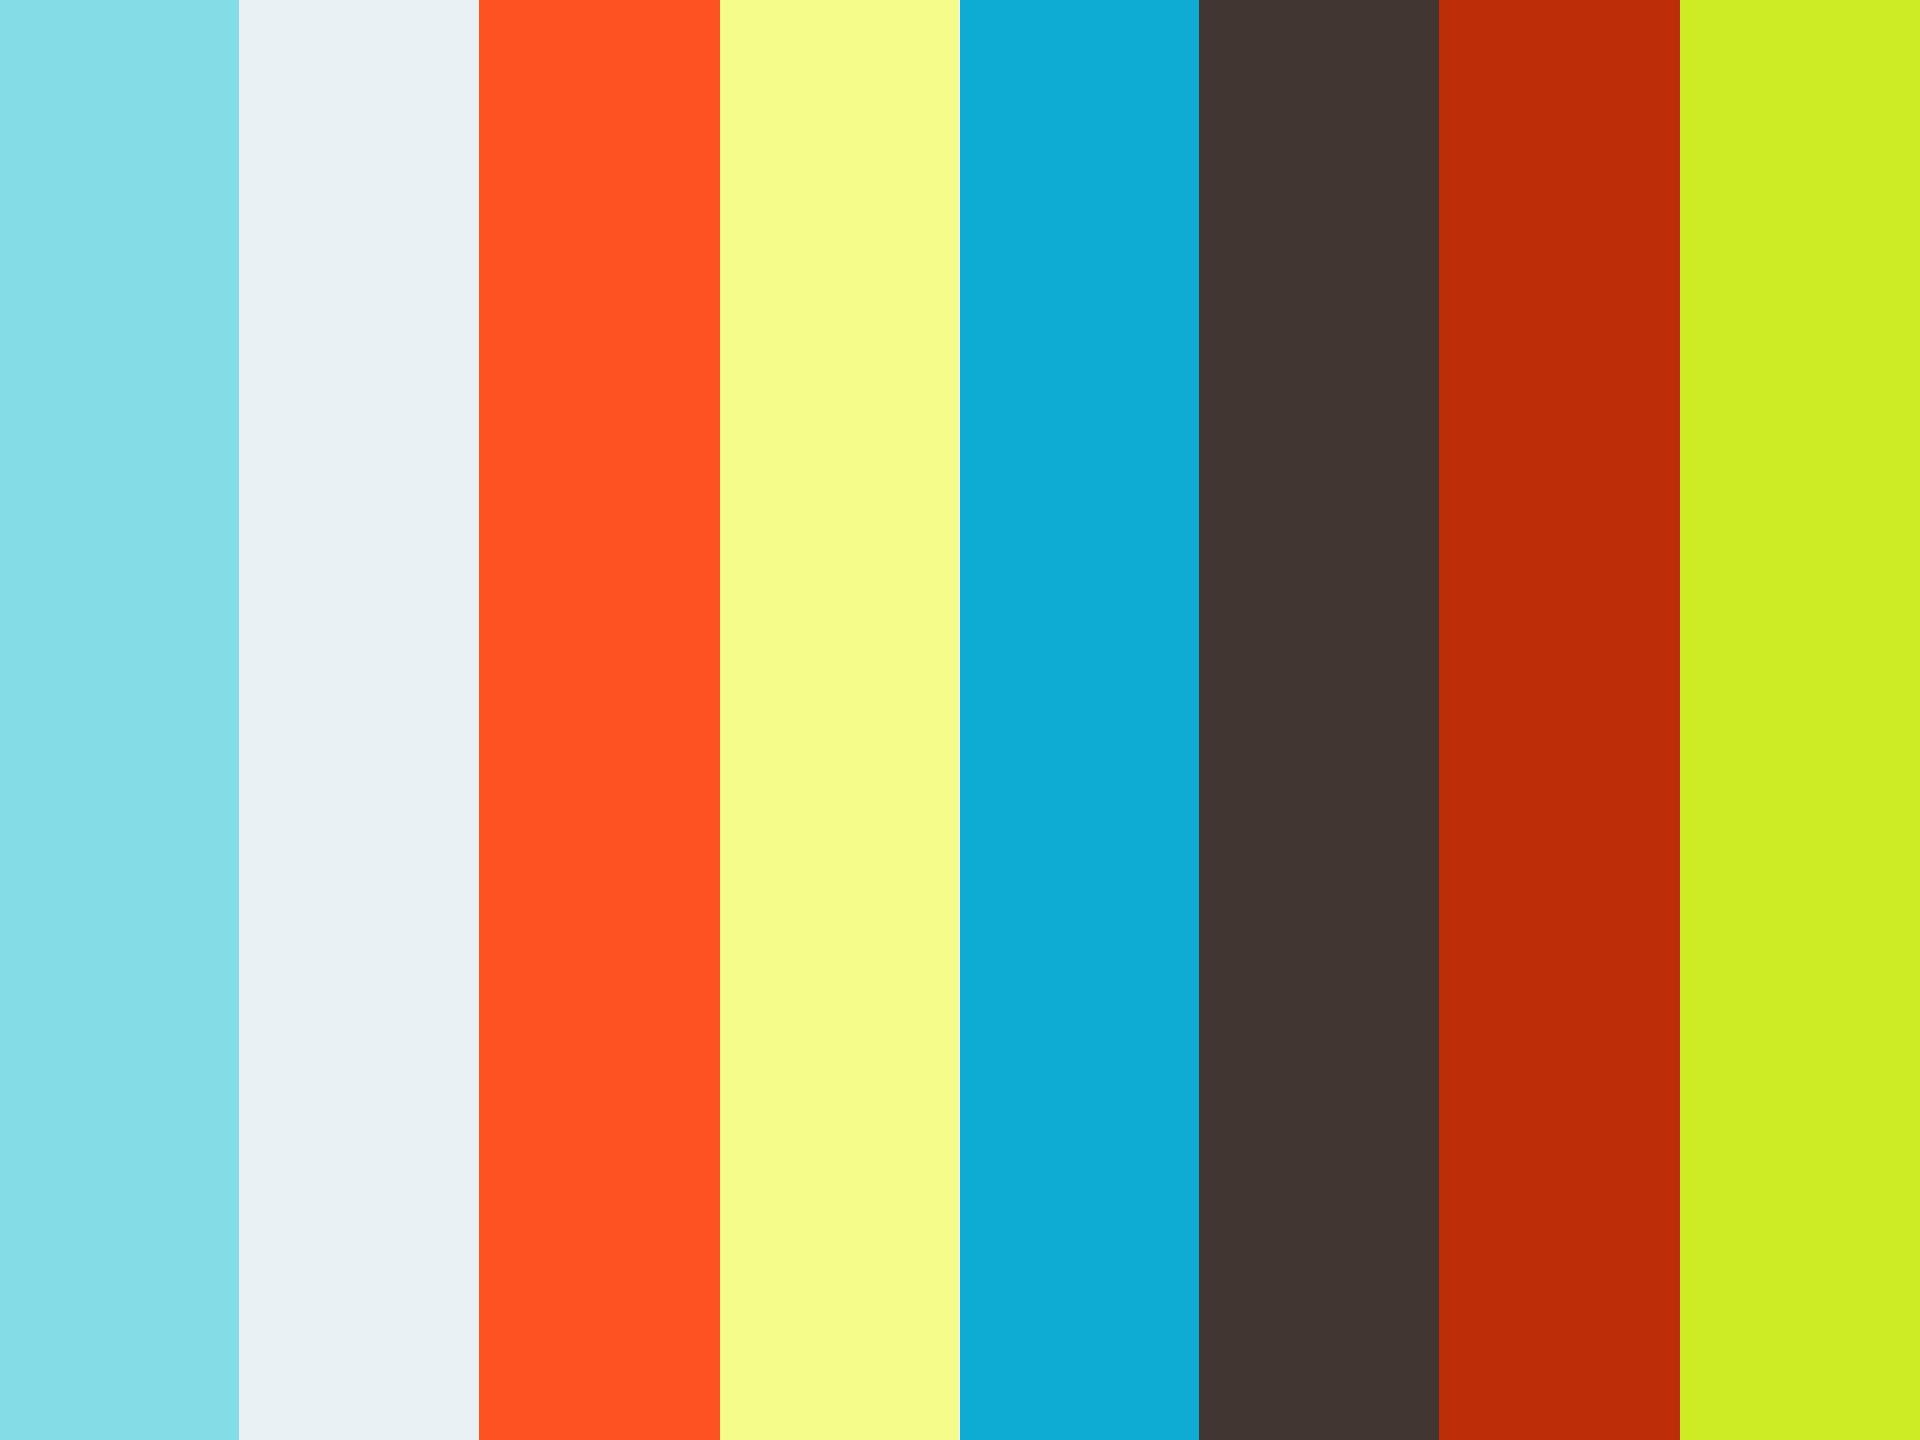 IPS e.max ジルキャド MT マルチ チェアサイドブロック草間幸夫先生によるビデオセミナー 【全10動画】#6: ミニング時のノウハウ